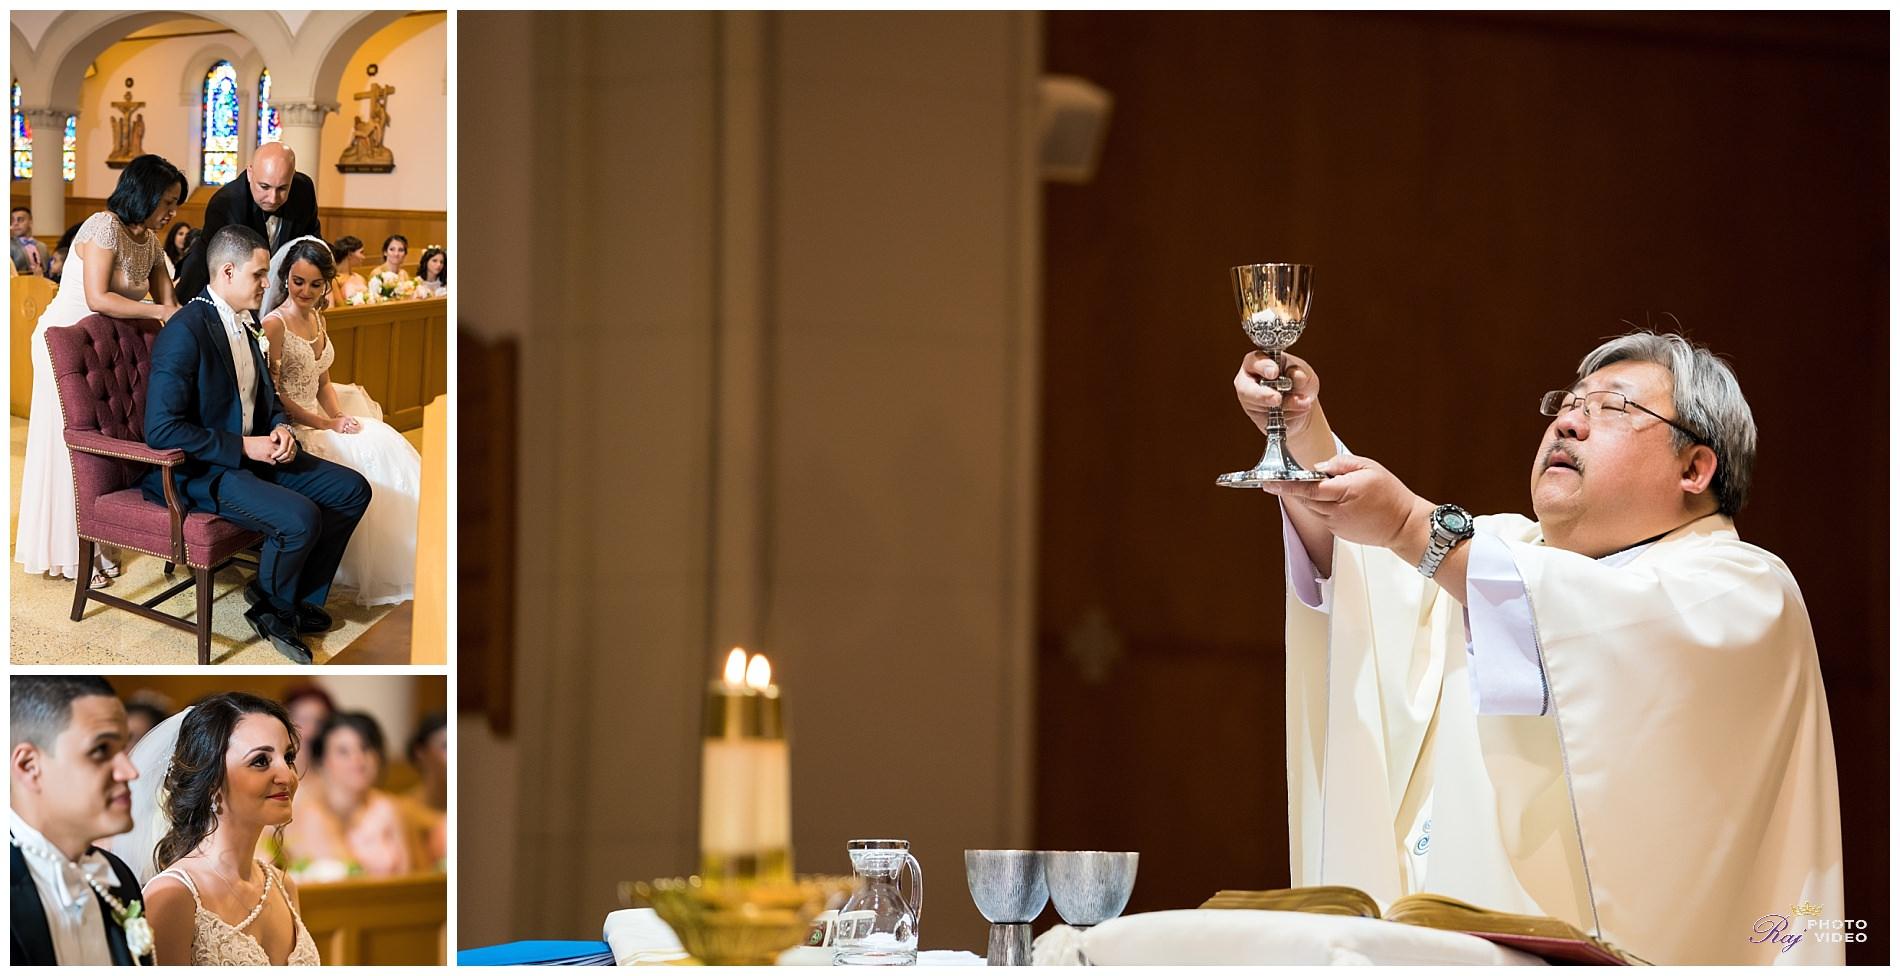 St-Valentines-Catholic-Church-Bloomfield-NJ-Wedding-Yanet-Jose-11.jpg